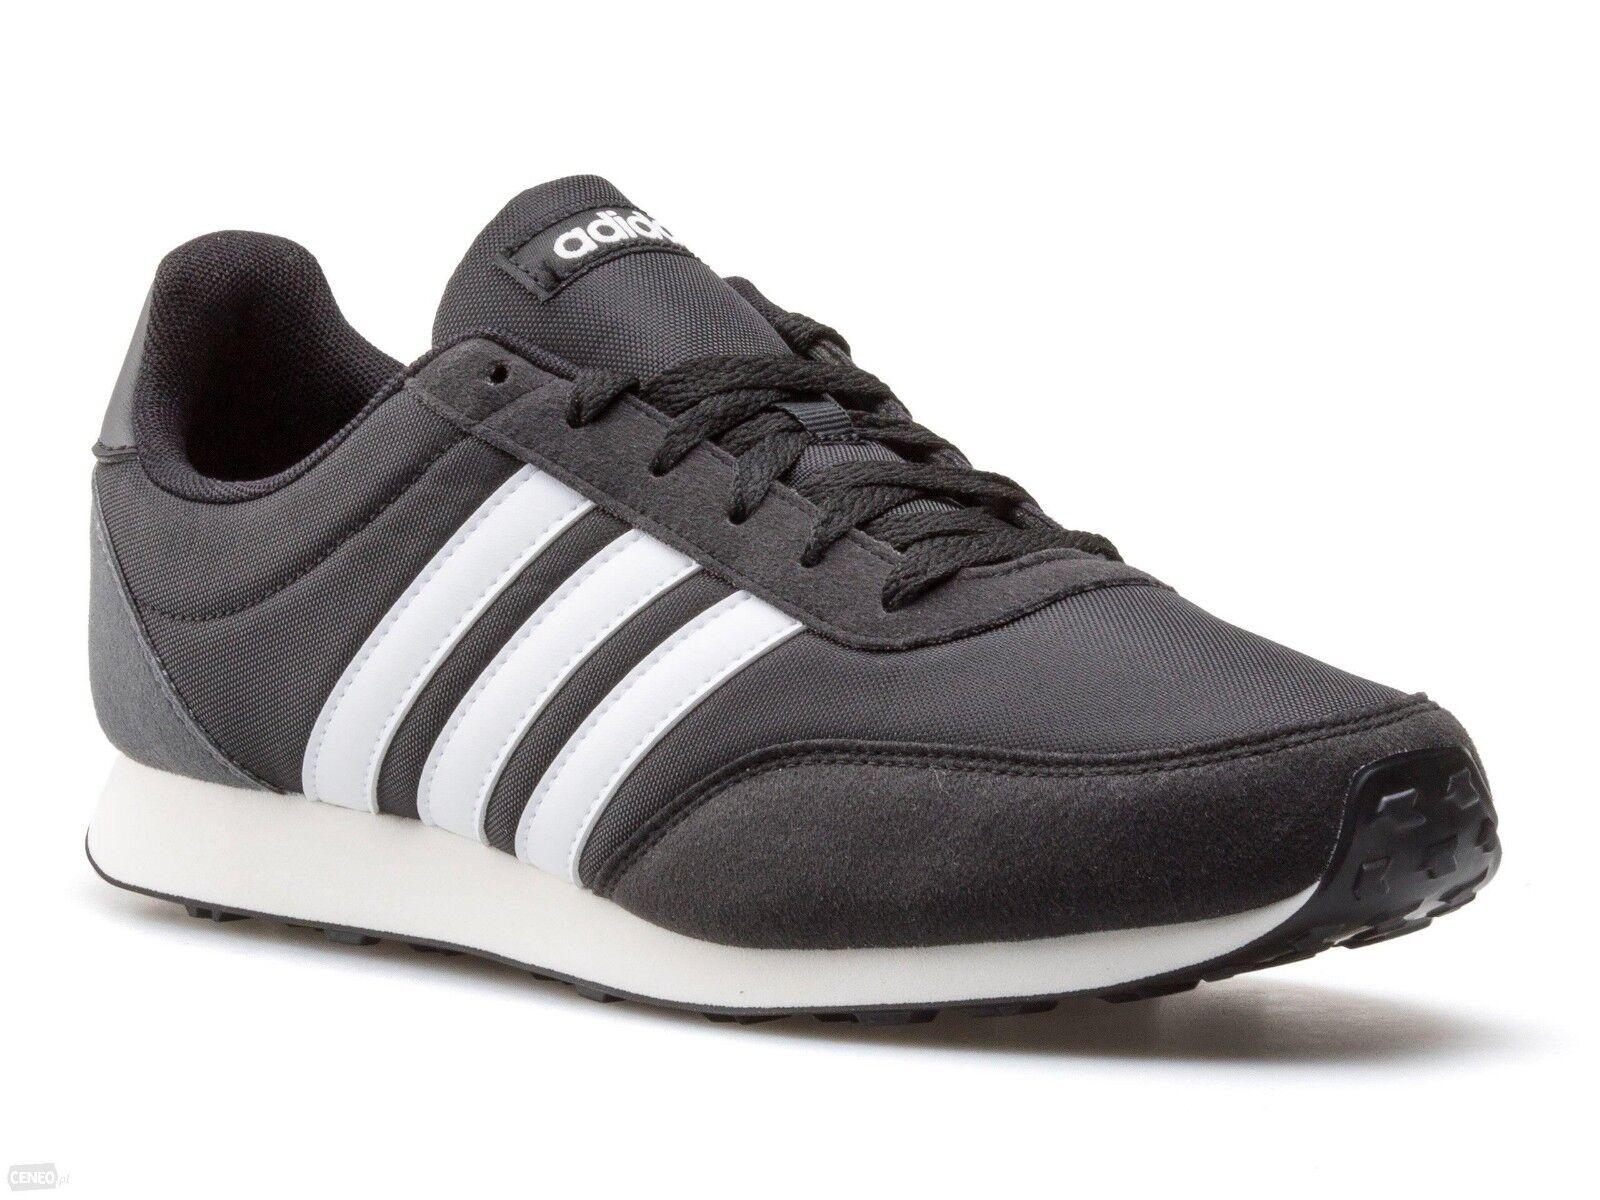 Nuevo adidas Racer Neo V Racer adidas 2.0 bc0106 zapatos caballero zapatillas de deporte cortos deporte negro 4fd3cc